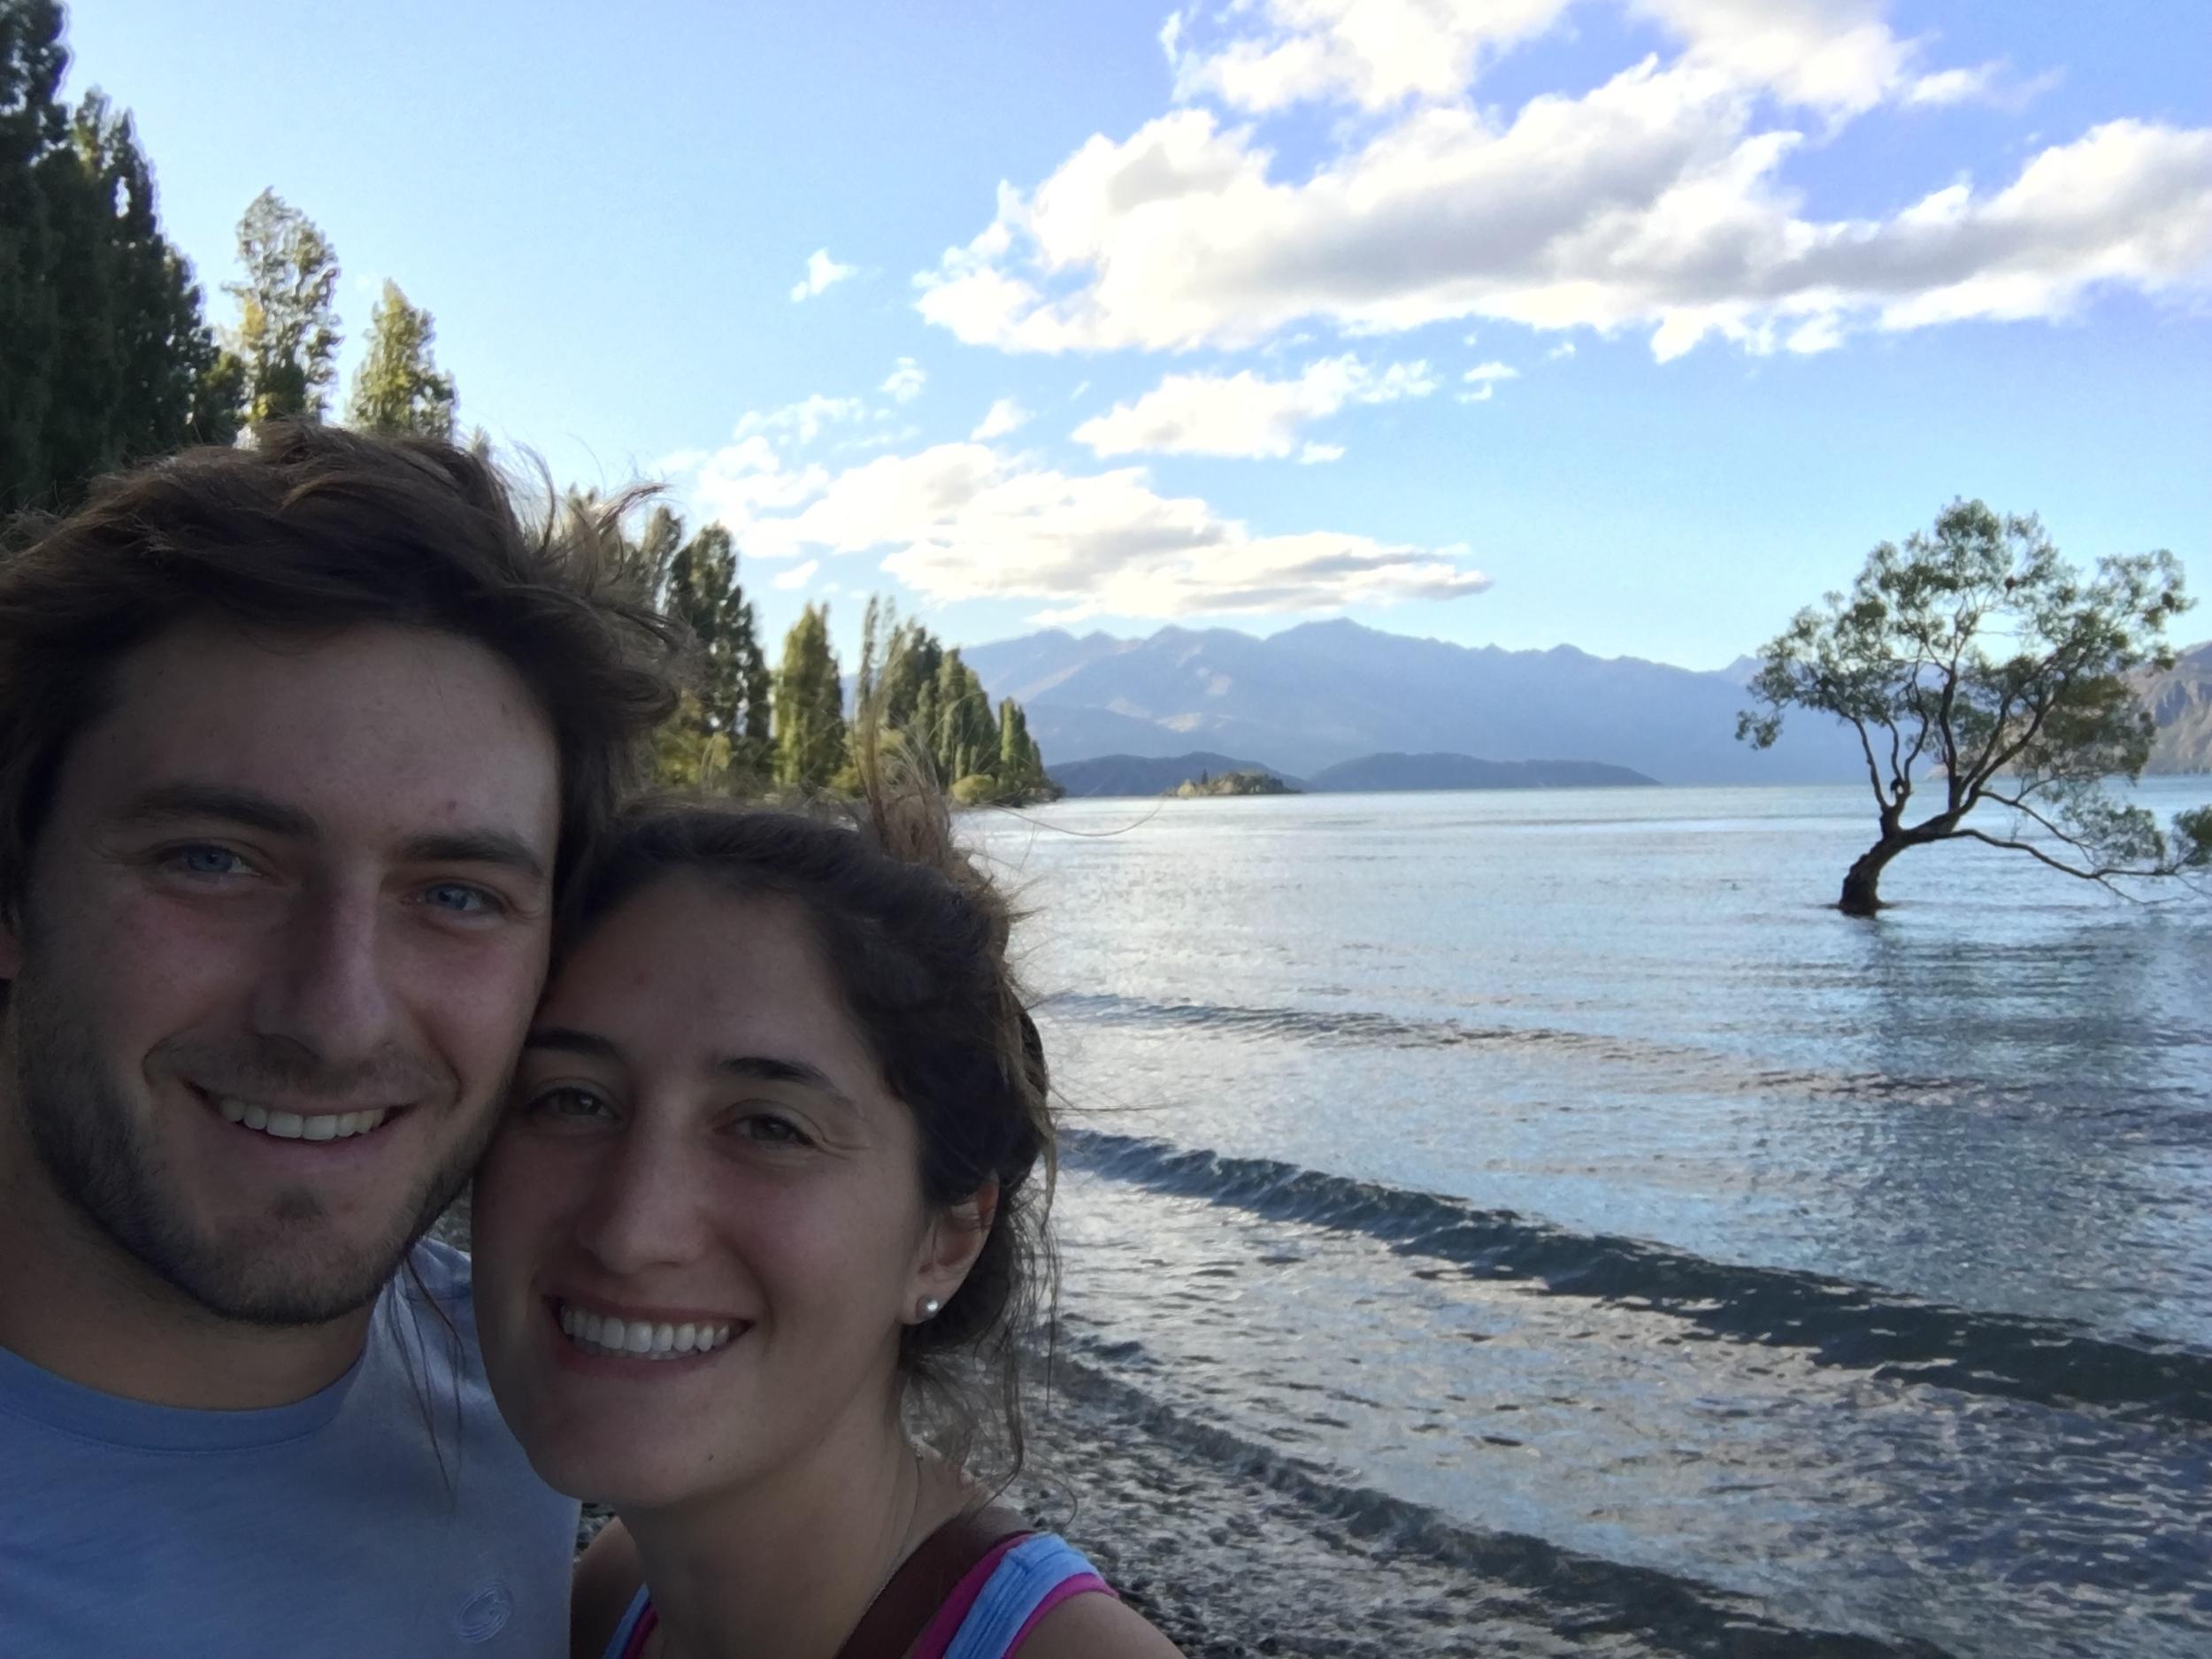 Selfie with Wanaka's Lone Tree